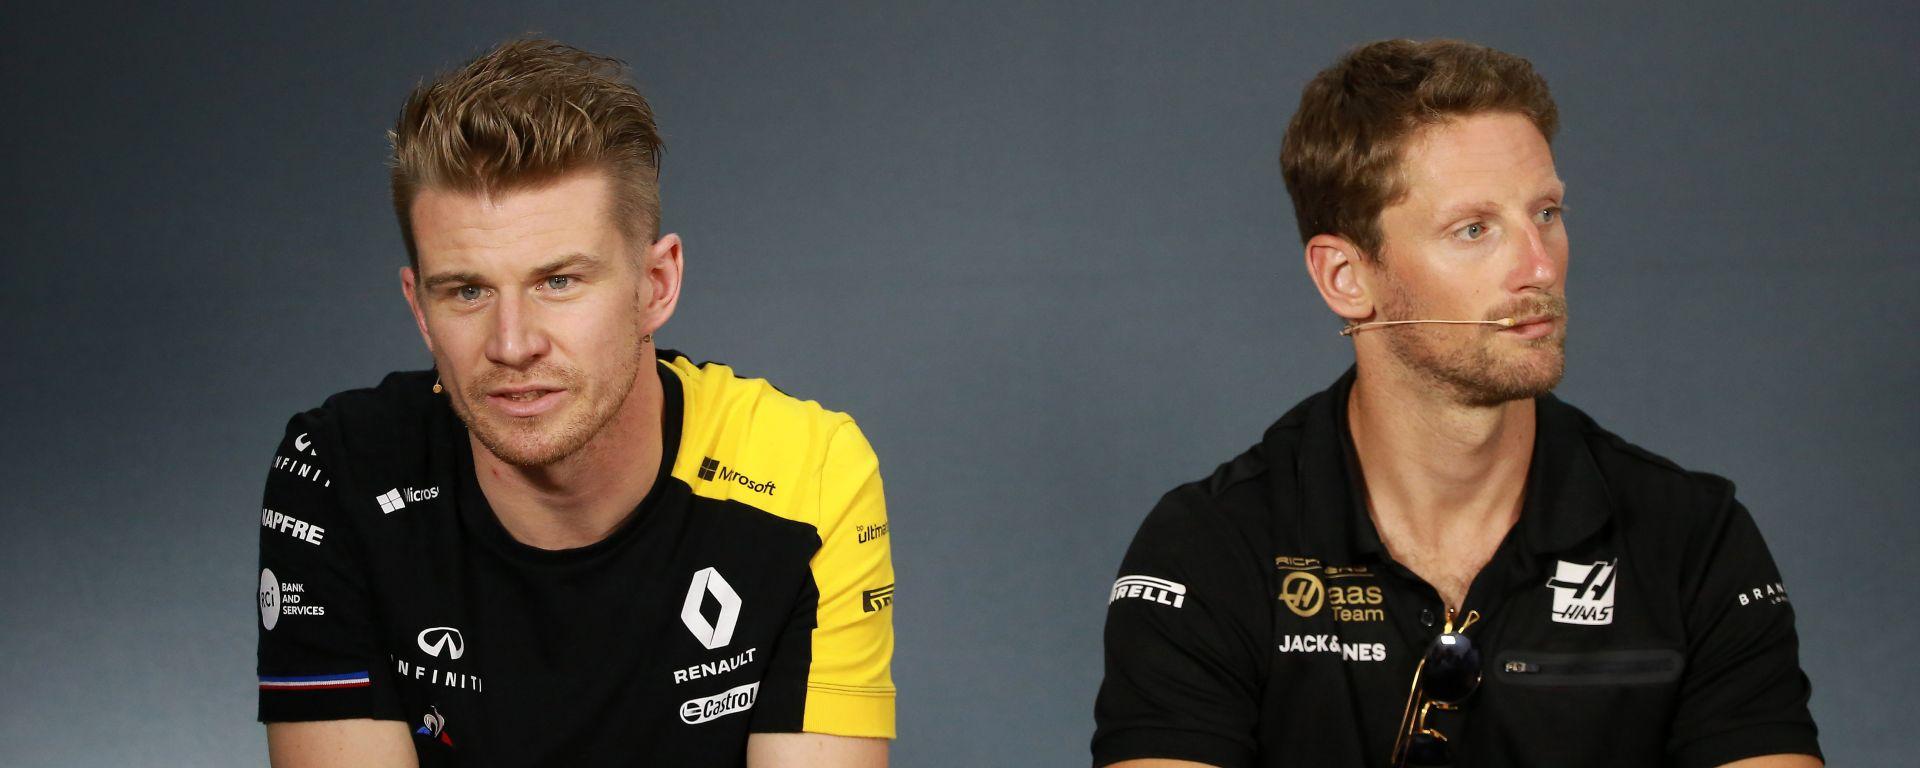 Nico Hulkenberg (Renault) e Romain Grosjean (Haas) in conferenza stampa al GP Francia 2019